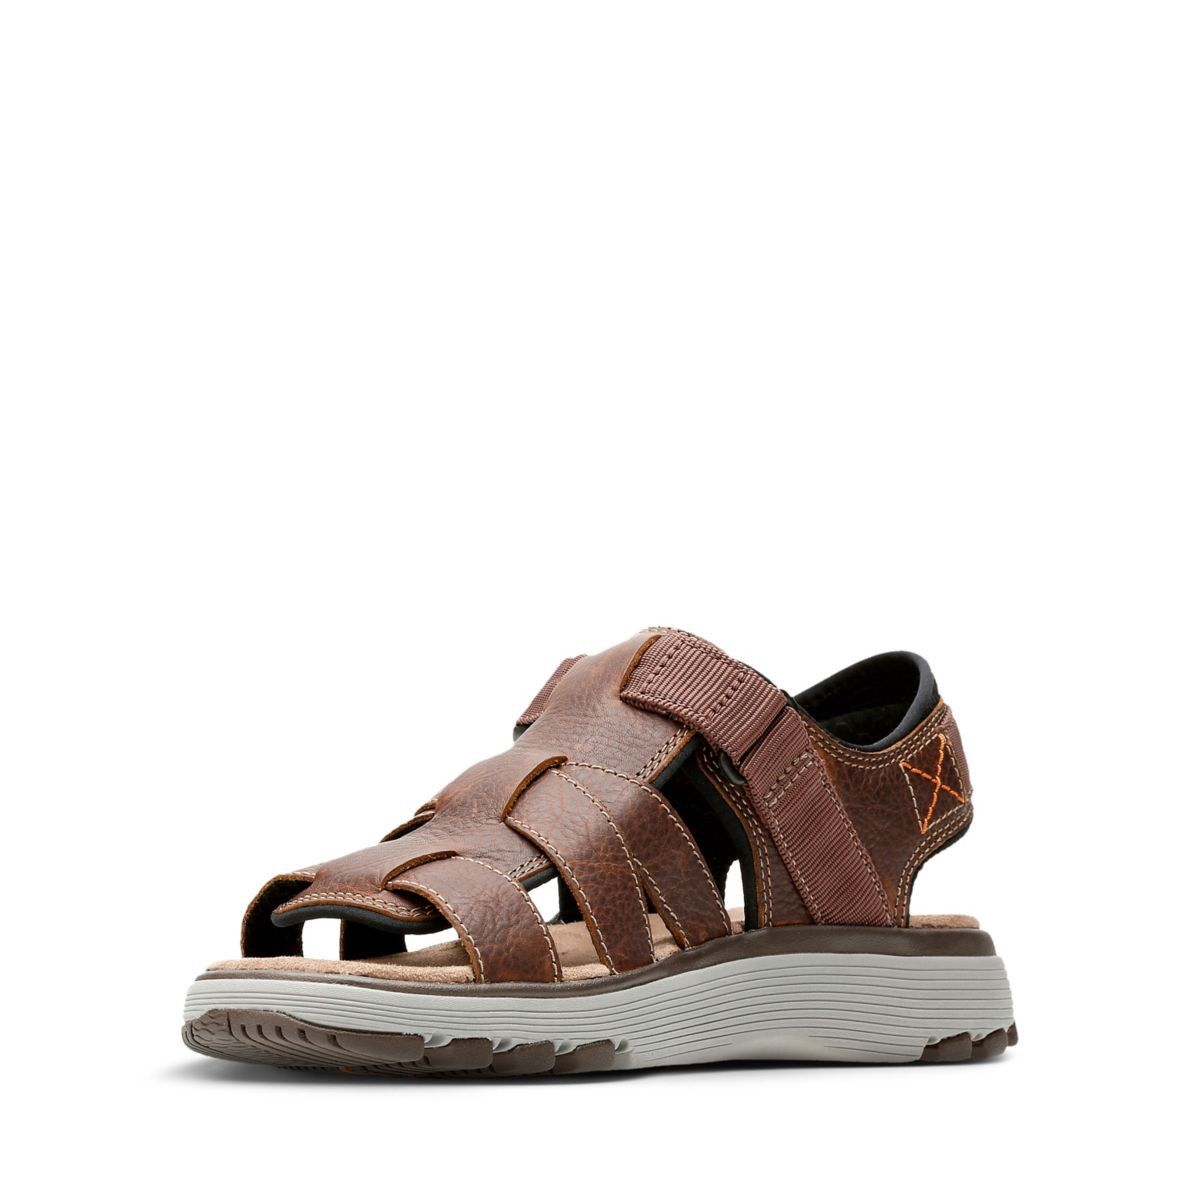 34a3a6a34e18 Clarks Un Trek Cove - Mens Sport Sandals Dark Tan Leather 10.5 ...